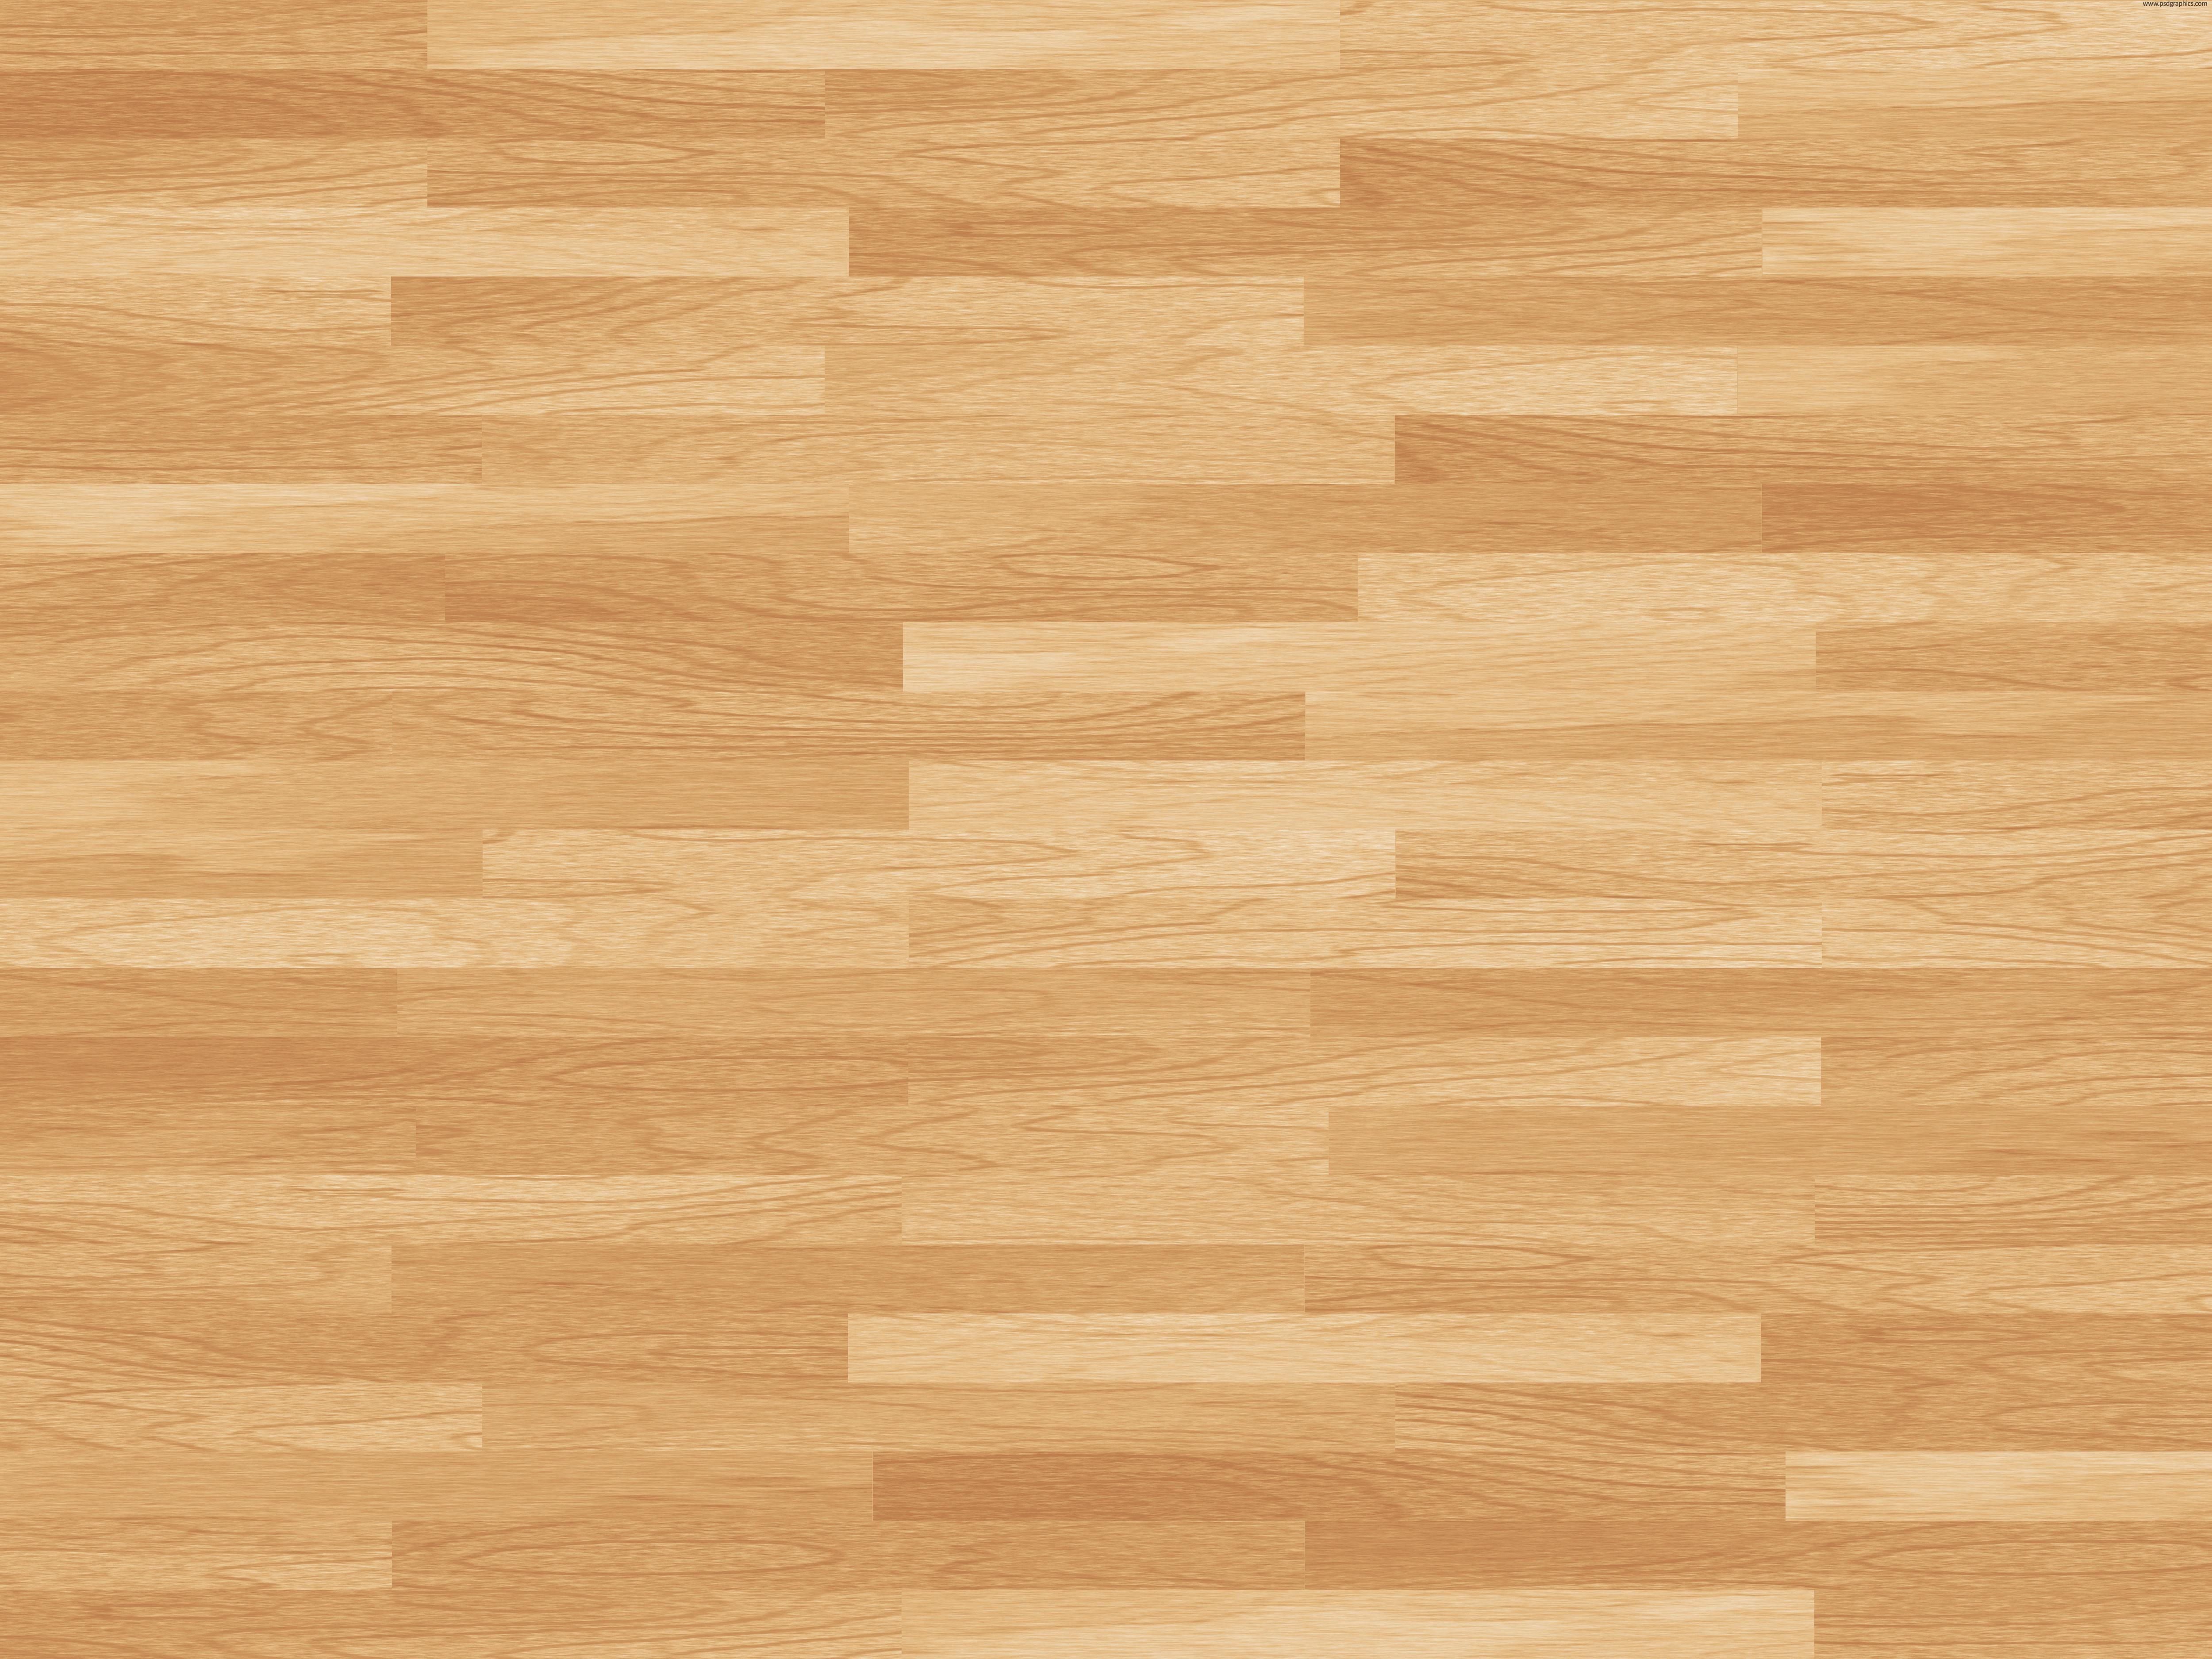 hardwood flooring texture RNGPZLD